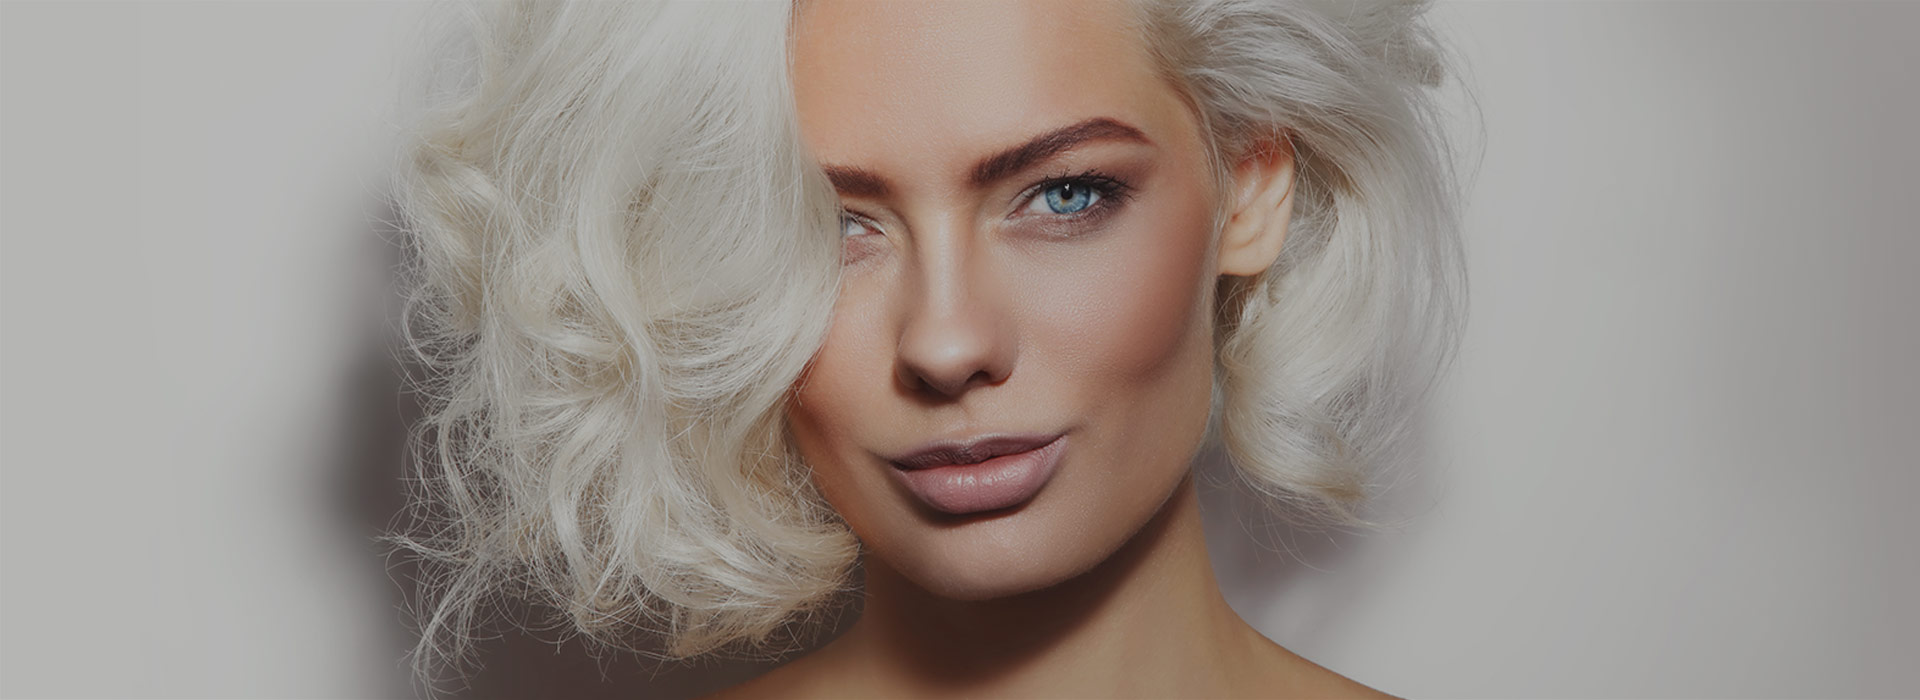 Simply Stunning Hair Makeup Fort Saskatchewan Hair Salon Canada